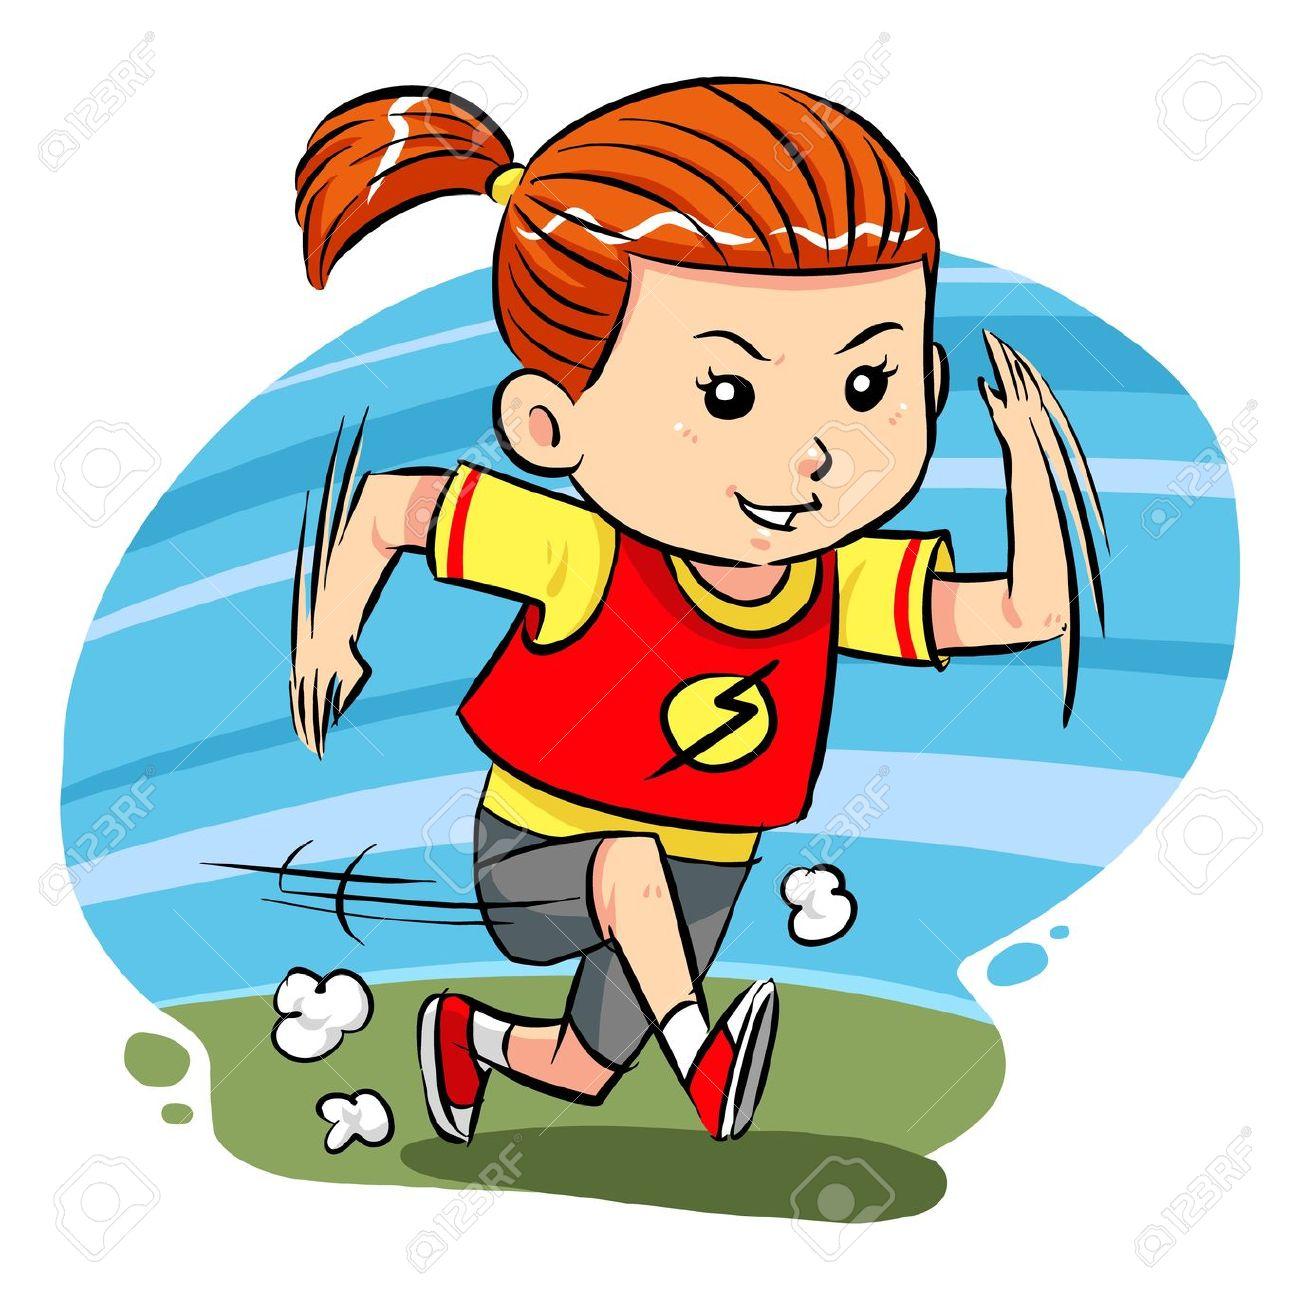 Girl running fast clipart.